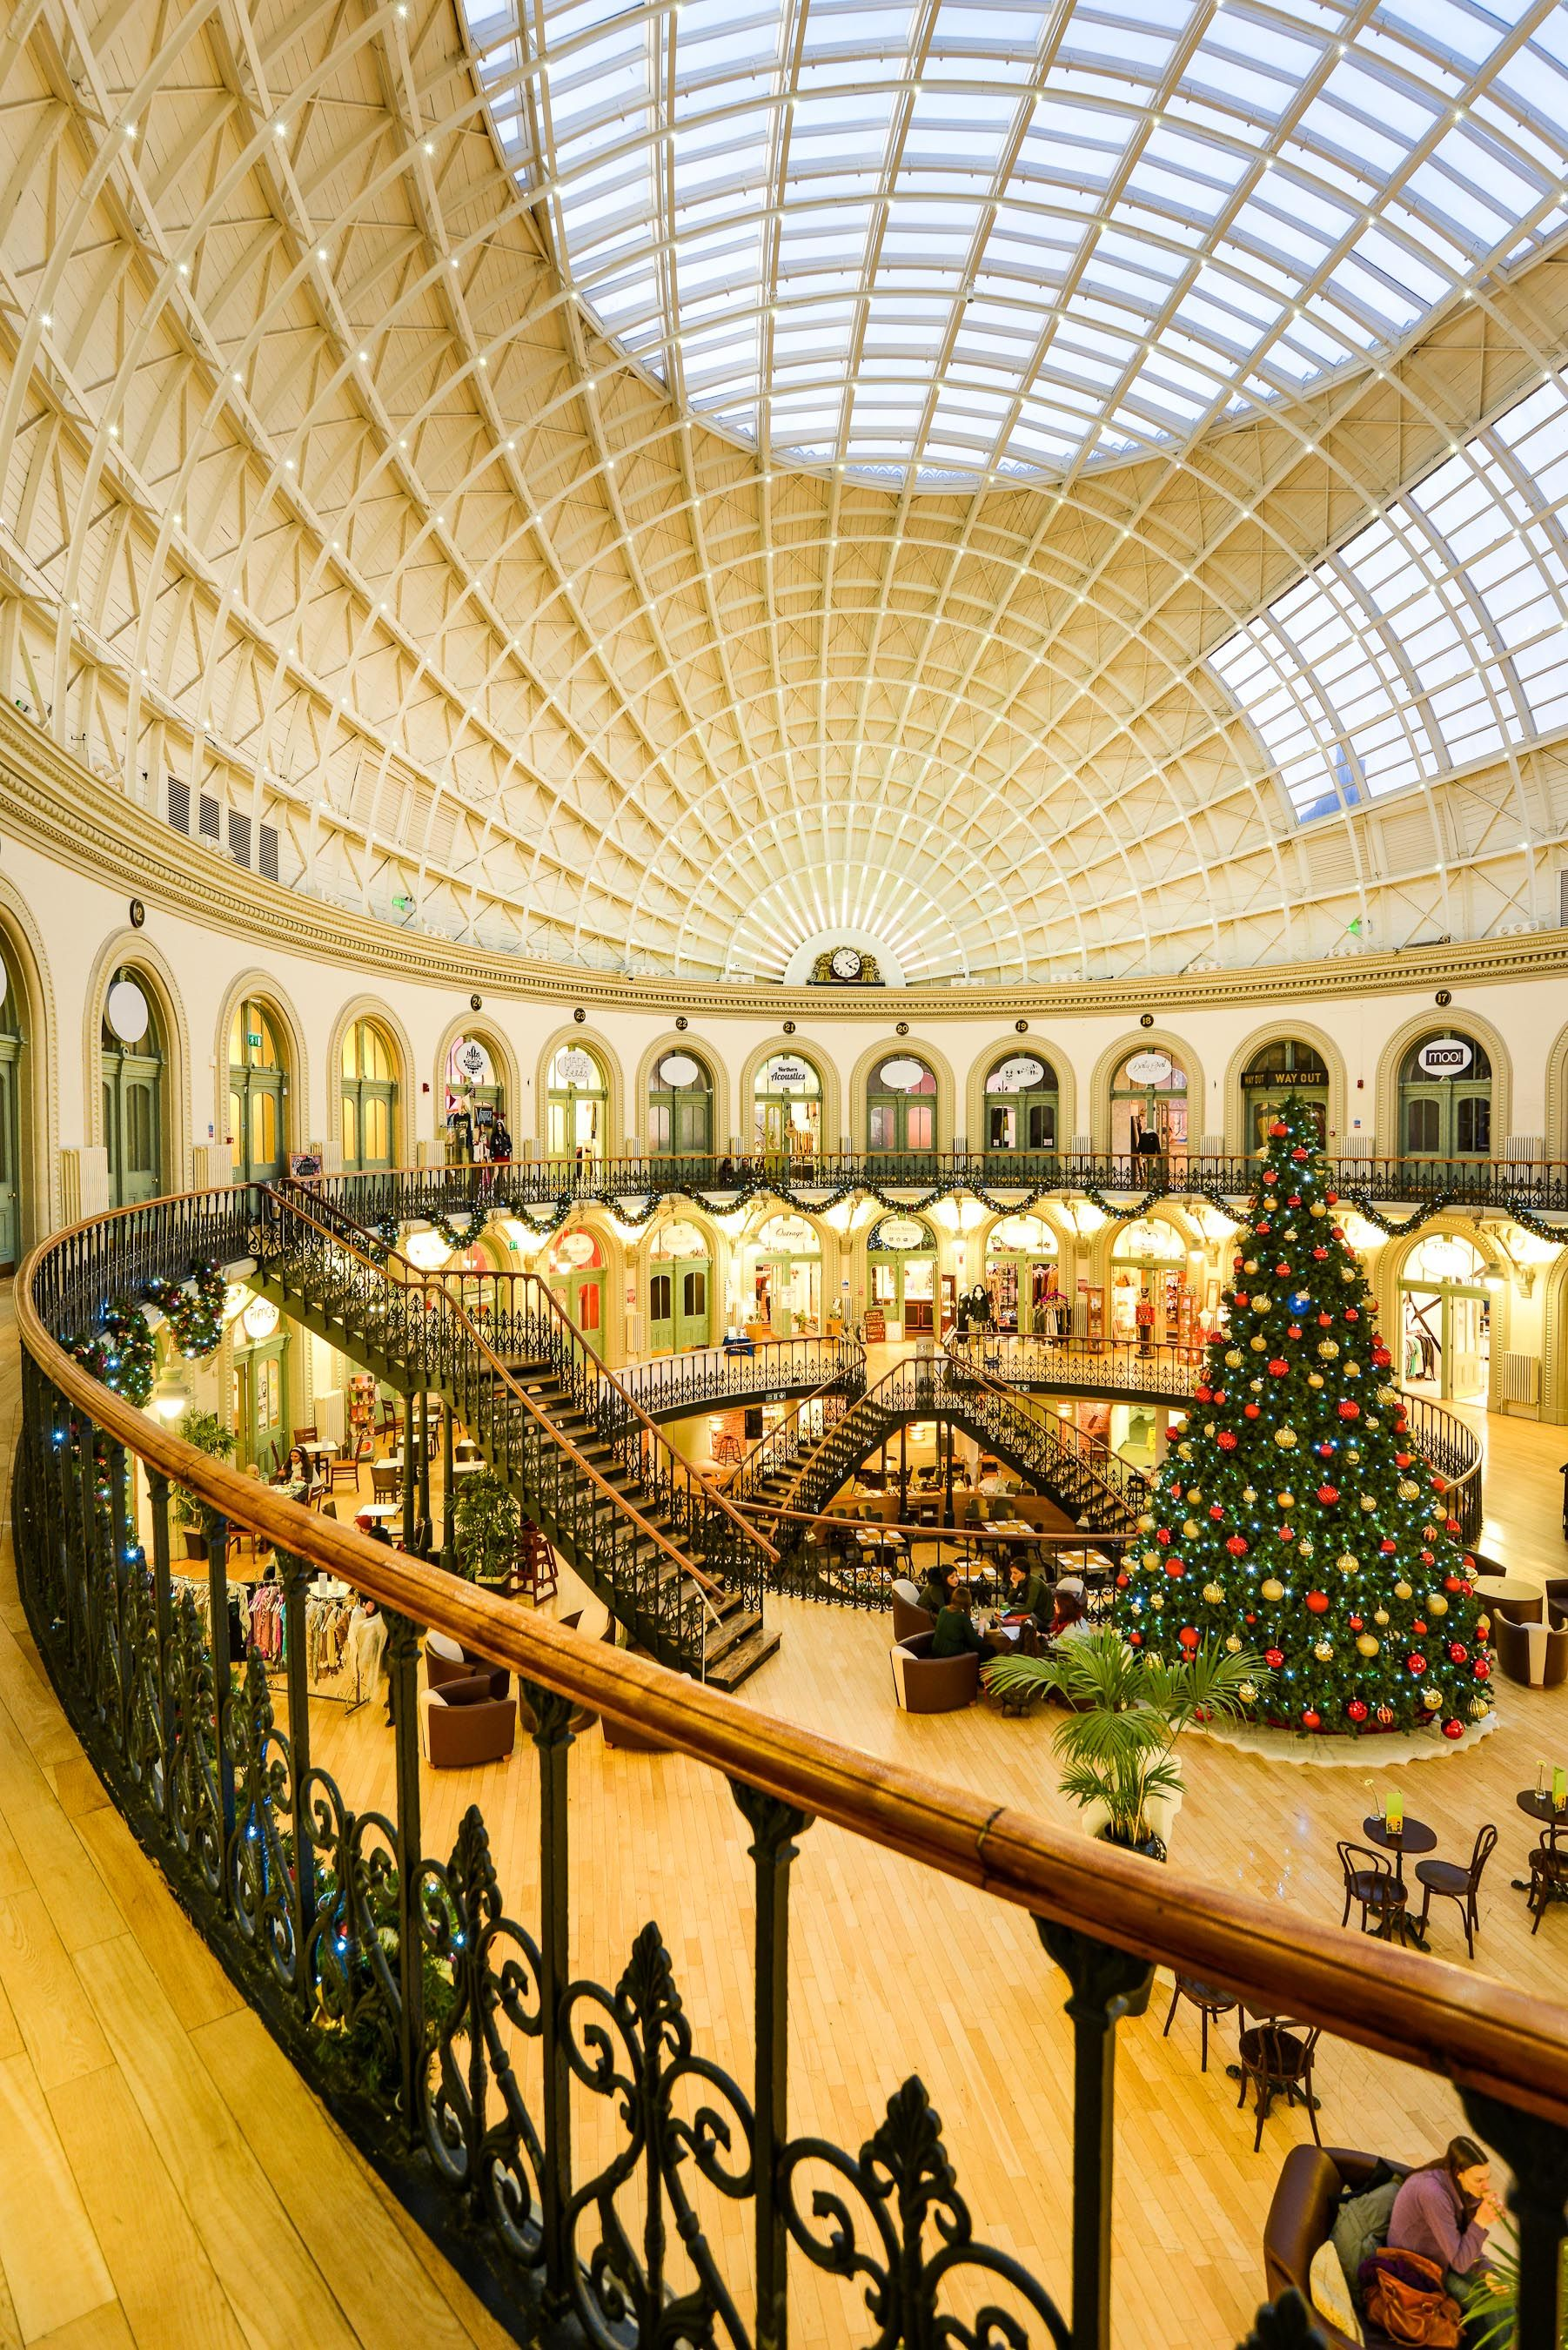 Christmas At Leeds Corn Exchange Leeds England Christmas Place Leeds